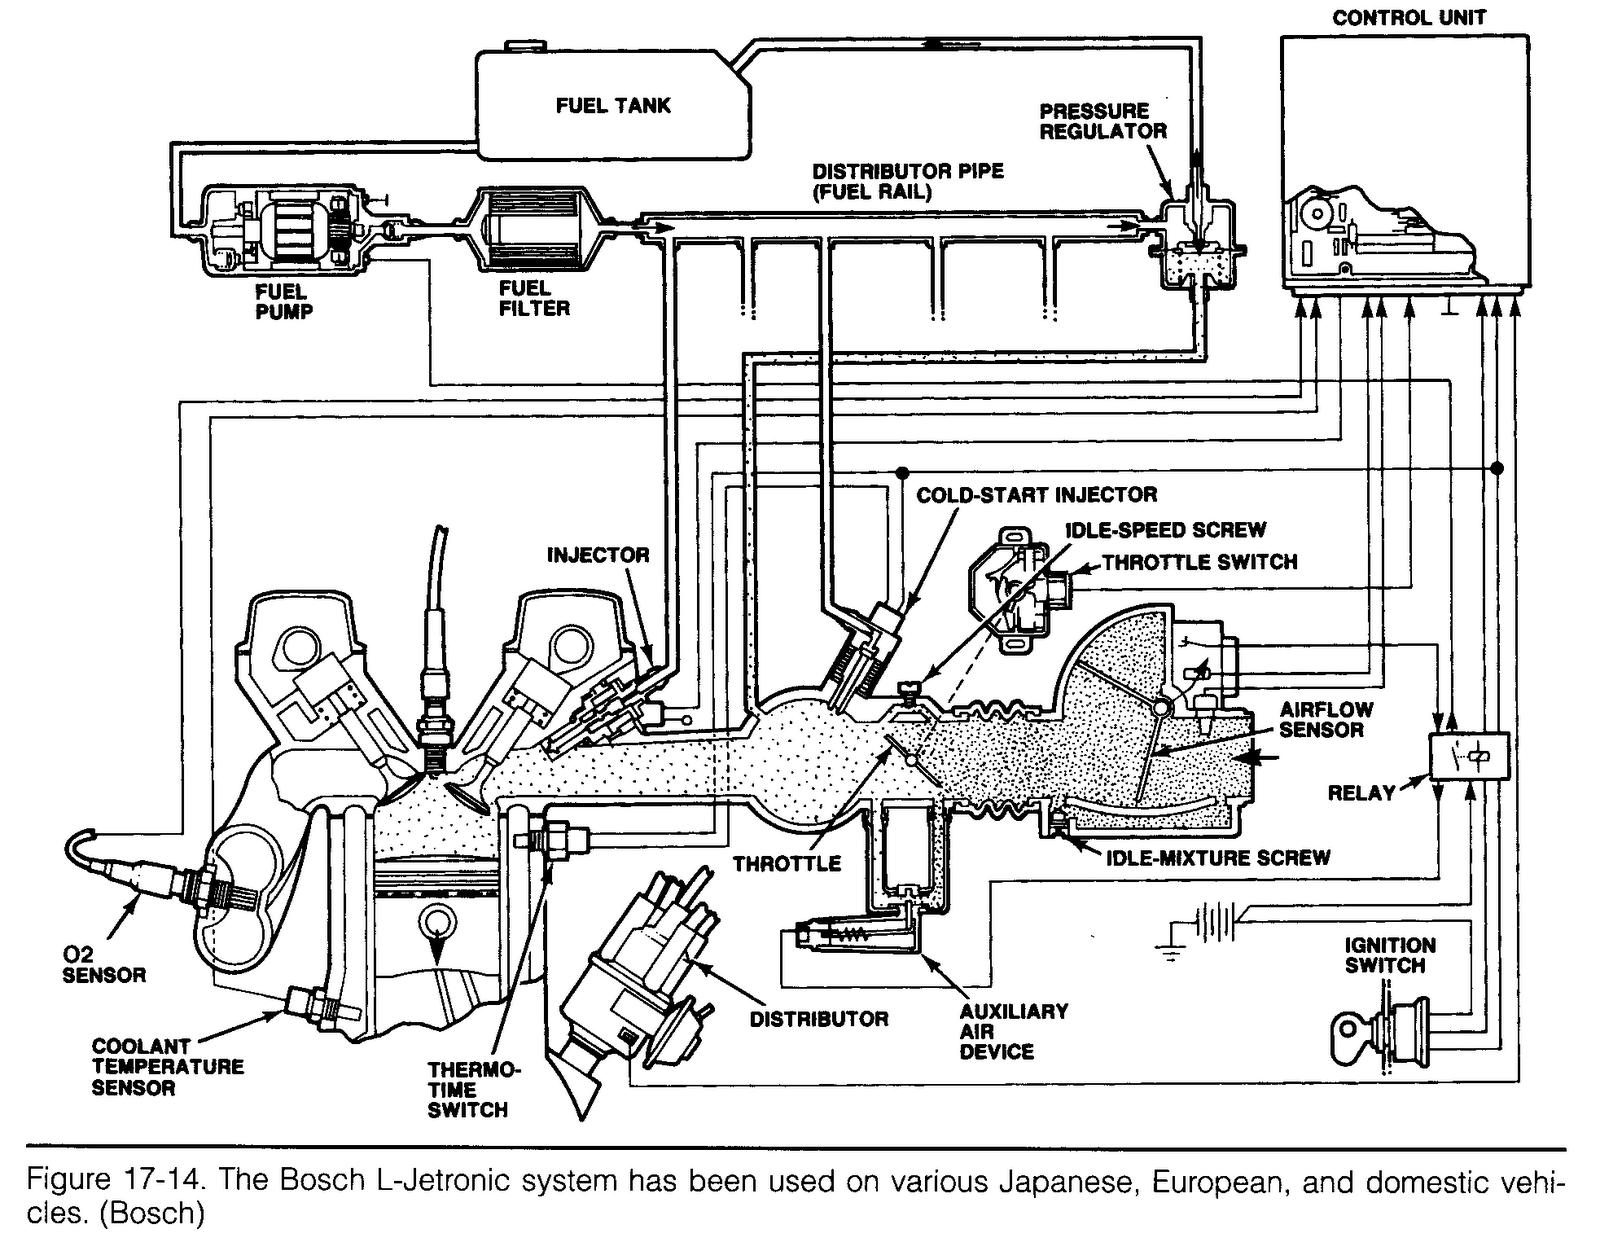 wiring diagram kelistrikan motor with Wiring Diagram Toyota Kijang Efi on Wiring Diagram Honda Vario 125 together with Honda Starter Wiring besides Dot R 6840 Wiring Diagrams additionally Wiring Diagram Toyota Kijang Efi as well Wiring Diagram Kelistrikan Vario 125.